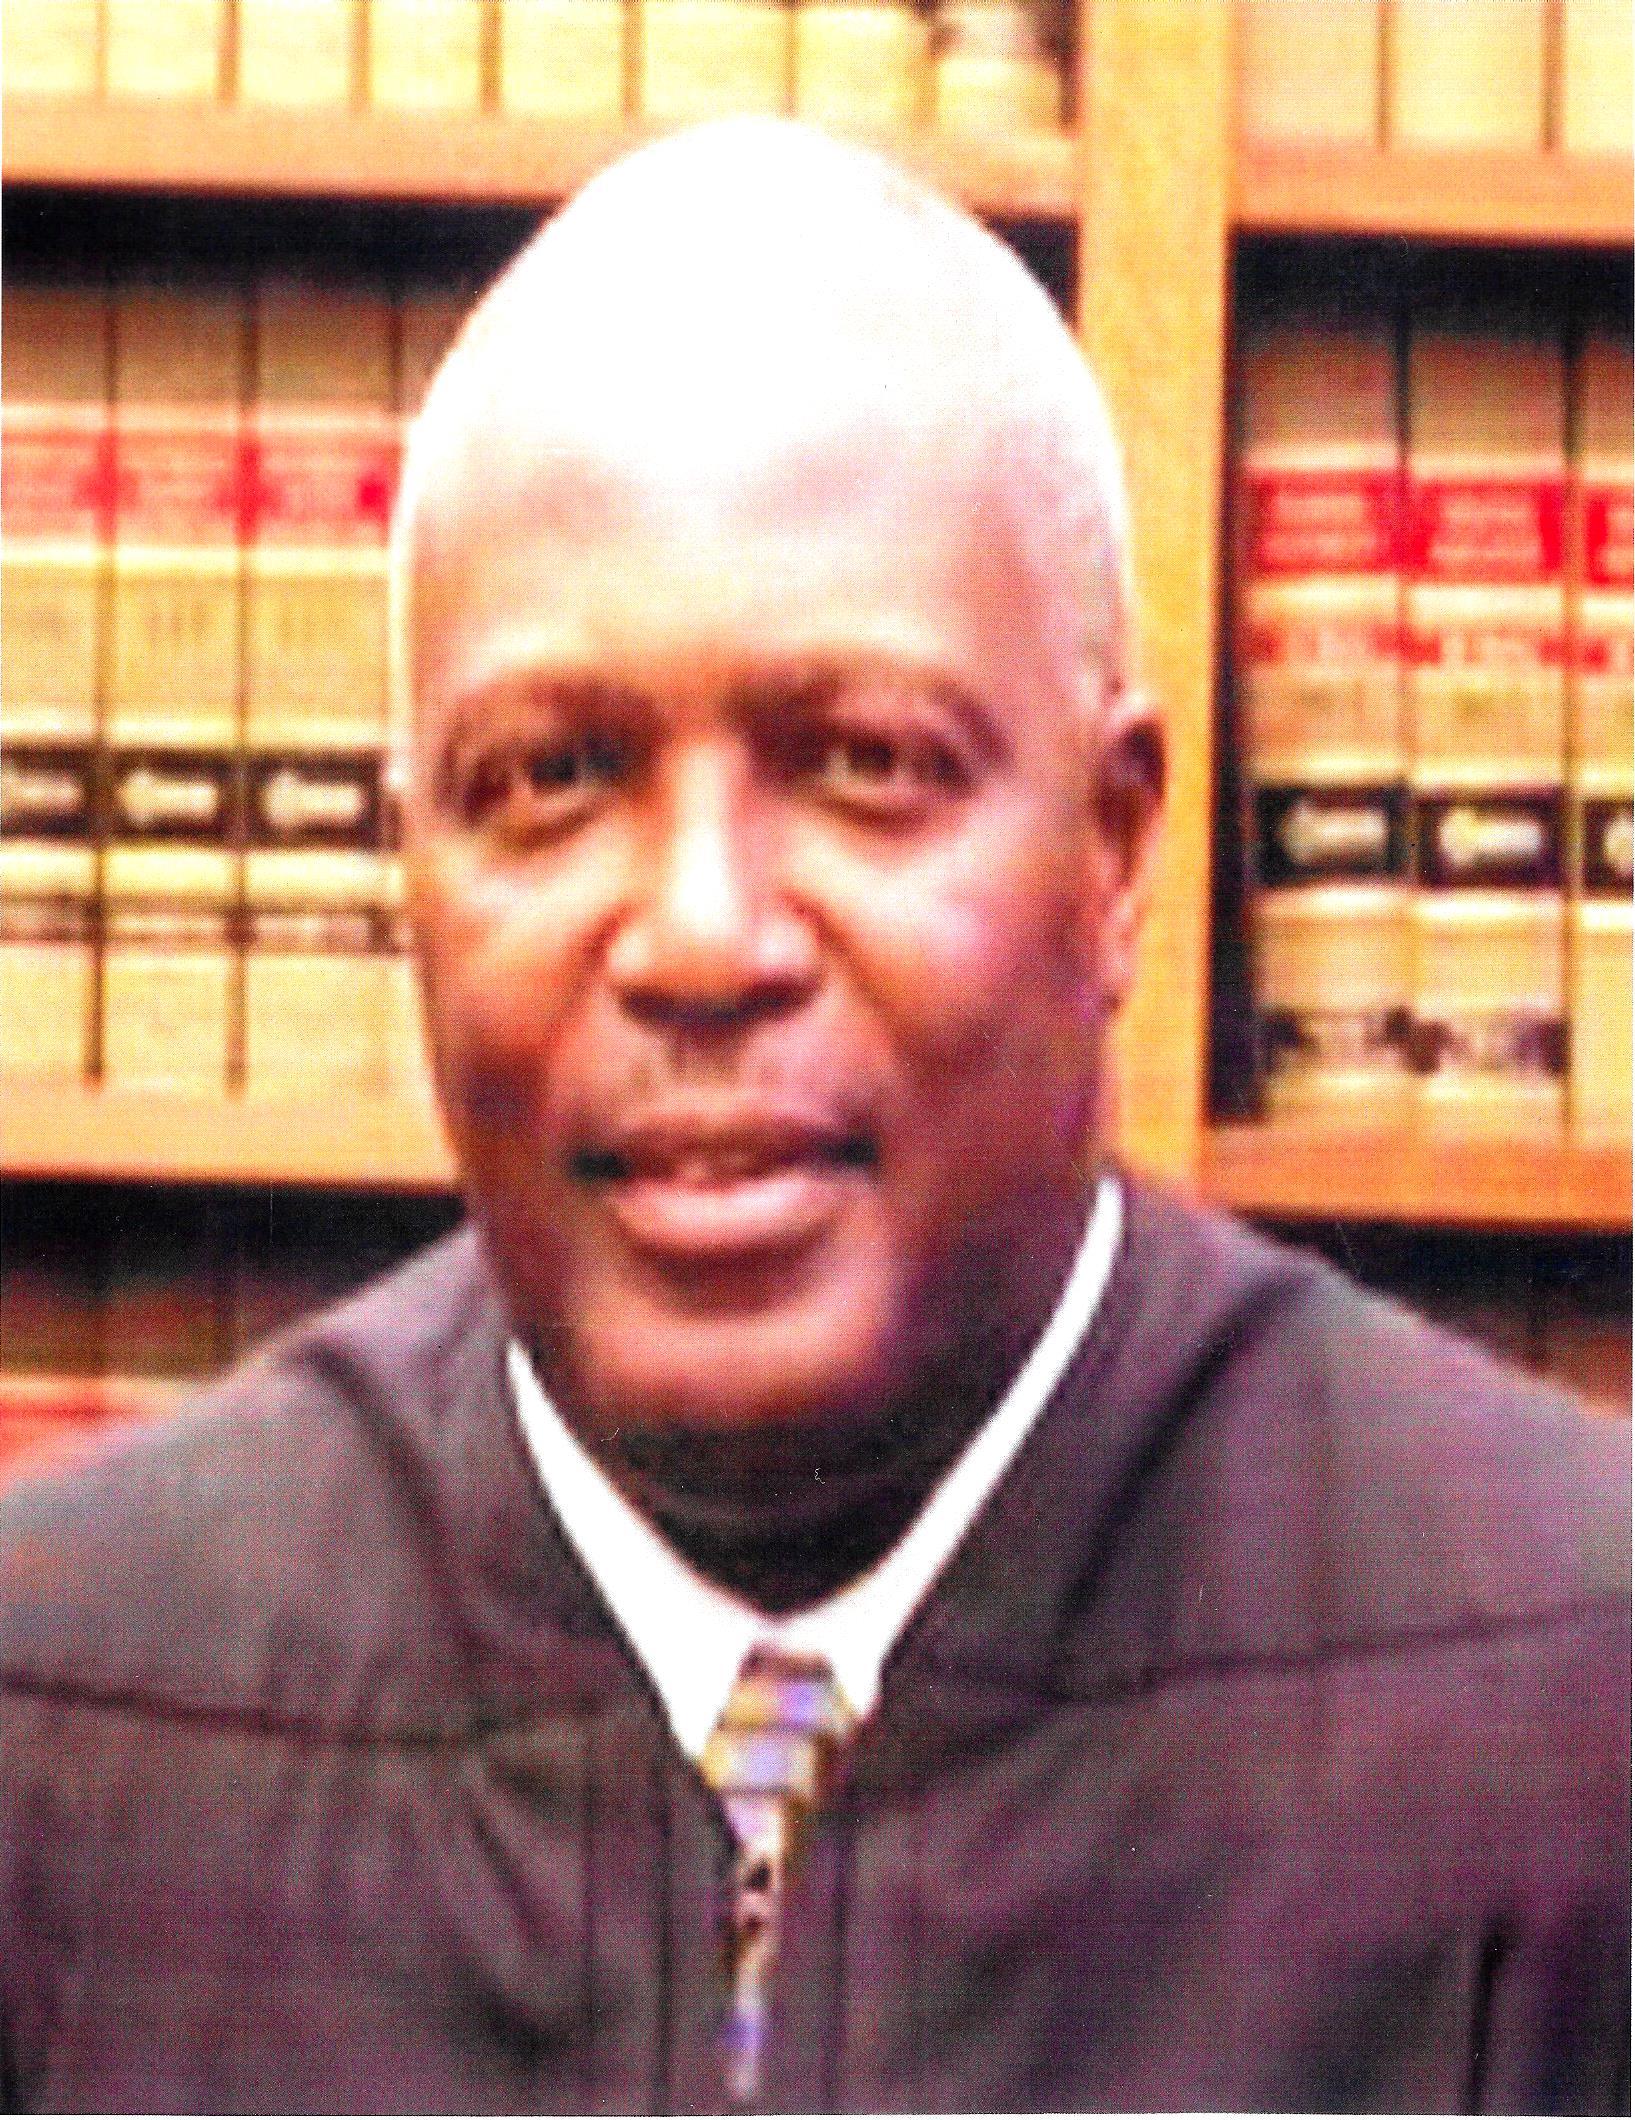 Judge Spencer